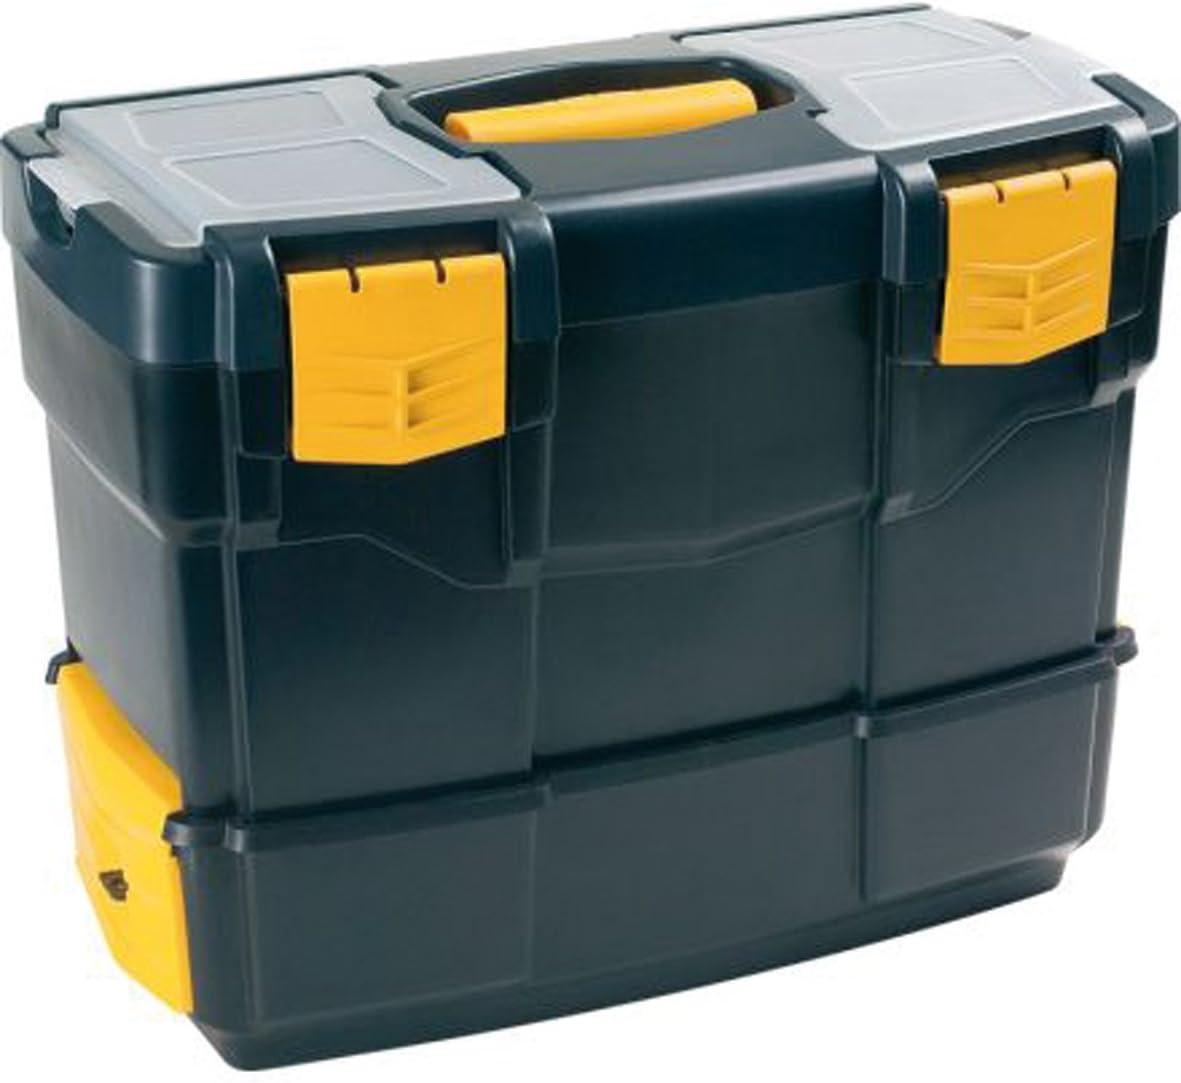 De pl/ástico, Negro, Amarillo Amarillo caja de herramientas Polipropileno Negro Art Plast 6500V De pl/ástico cajas de herramientas